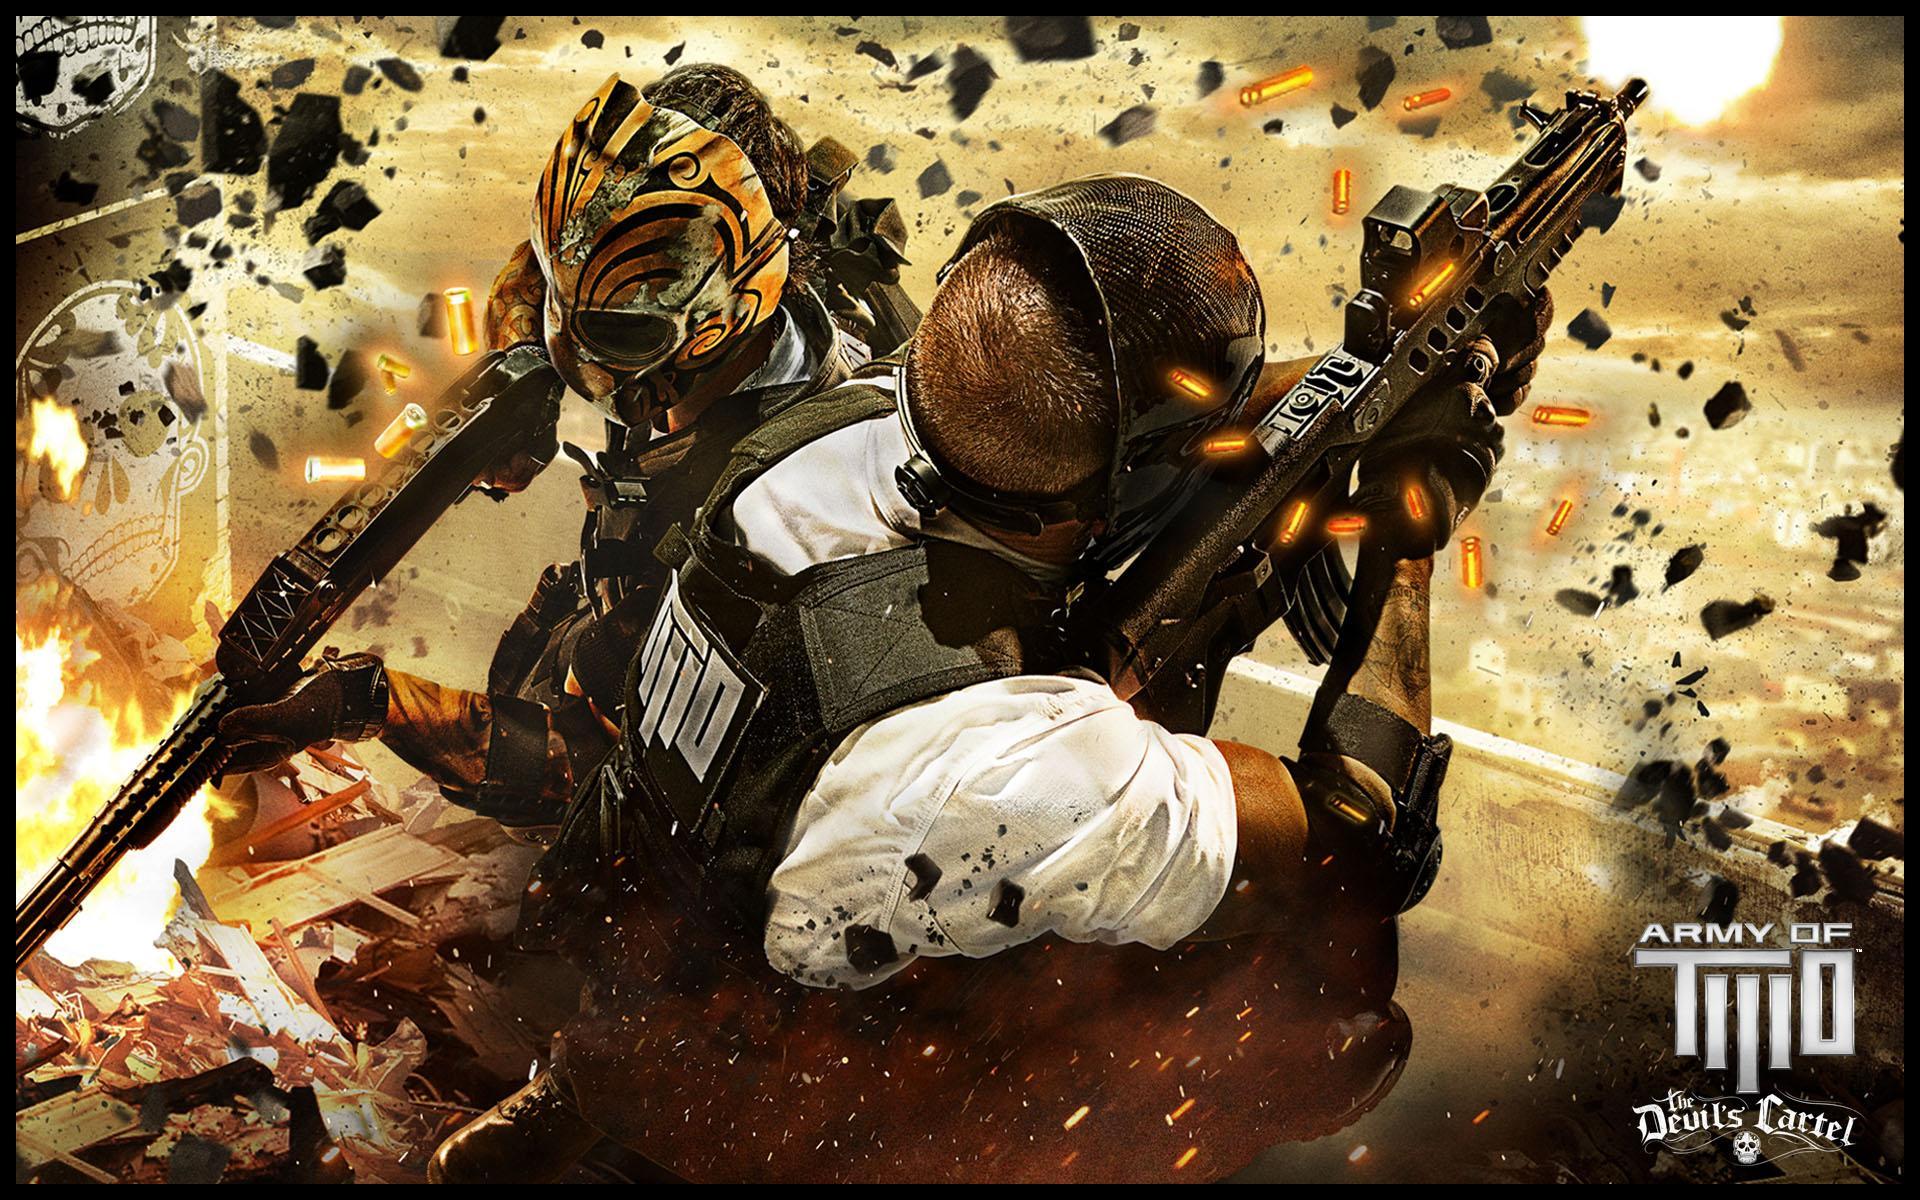 Game Similar To Gears Of War